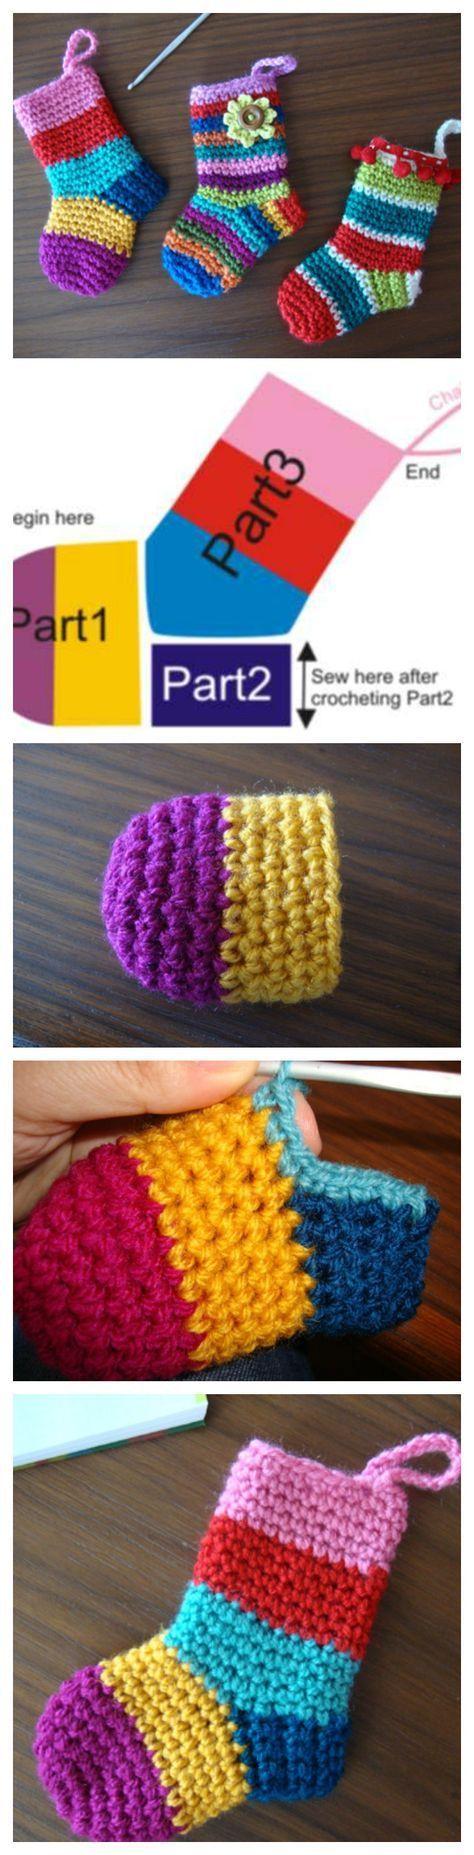 Mini Christmas Stockings Crochet Pattern                                                                                                                                                                                 More